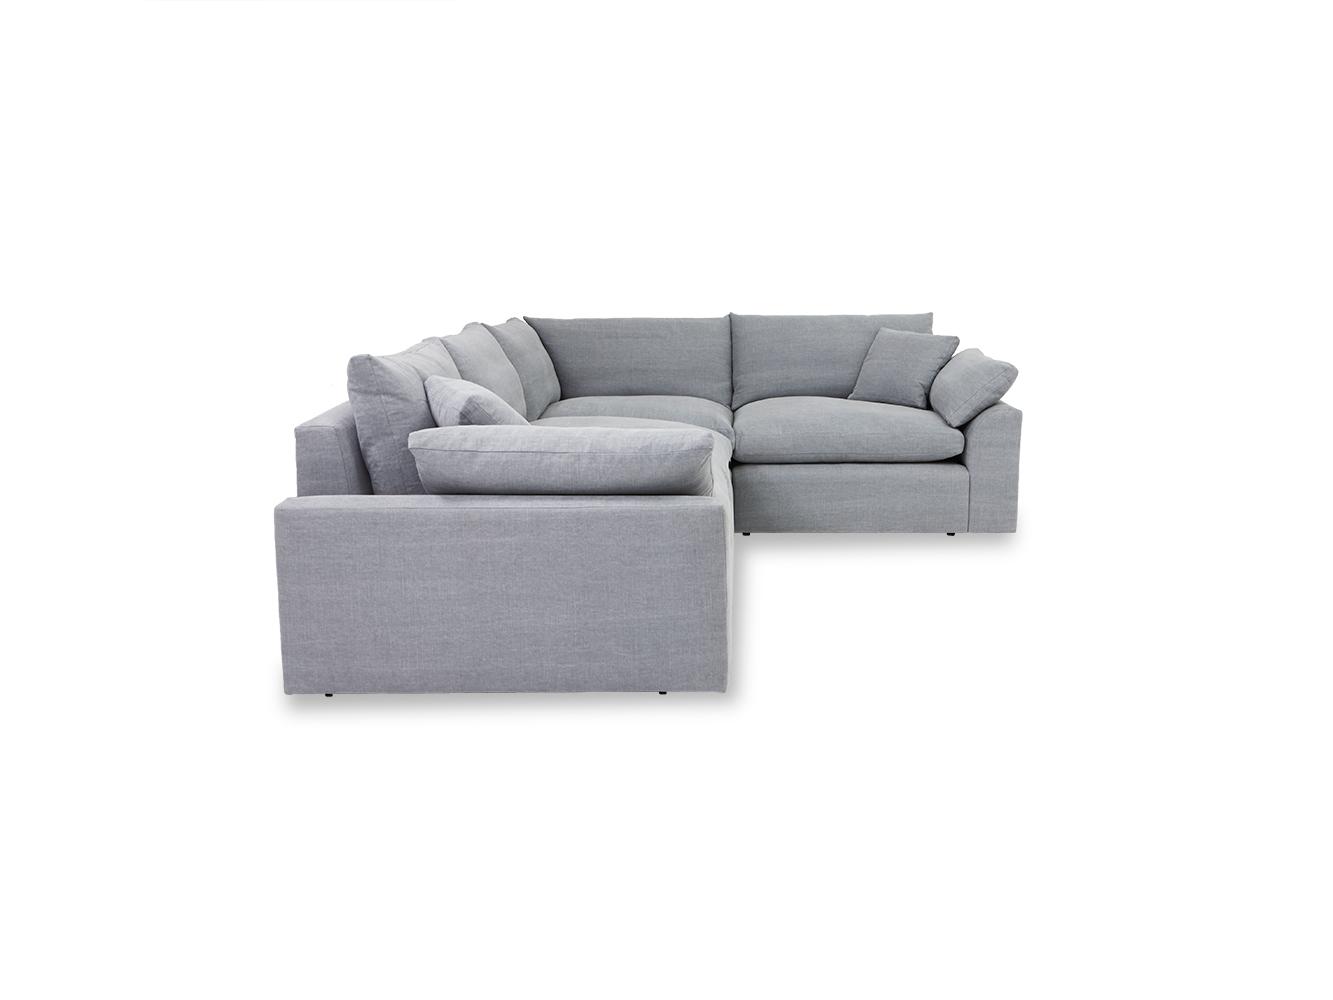 Cuddlein Corner Sofa L Shaped